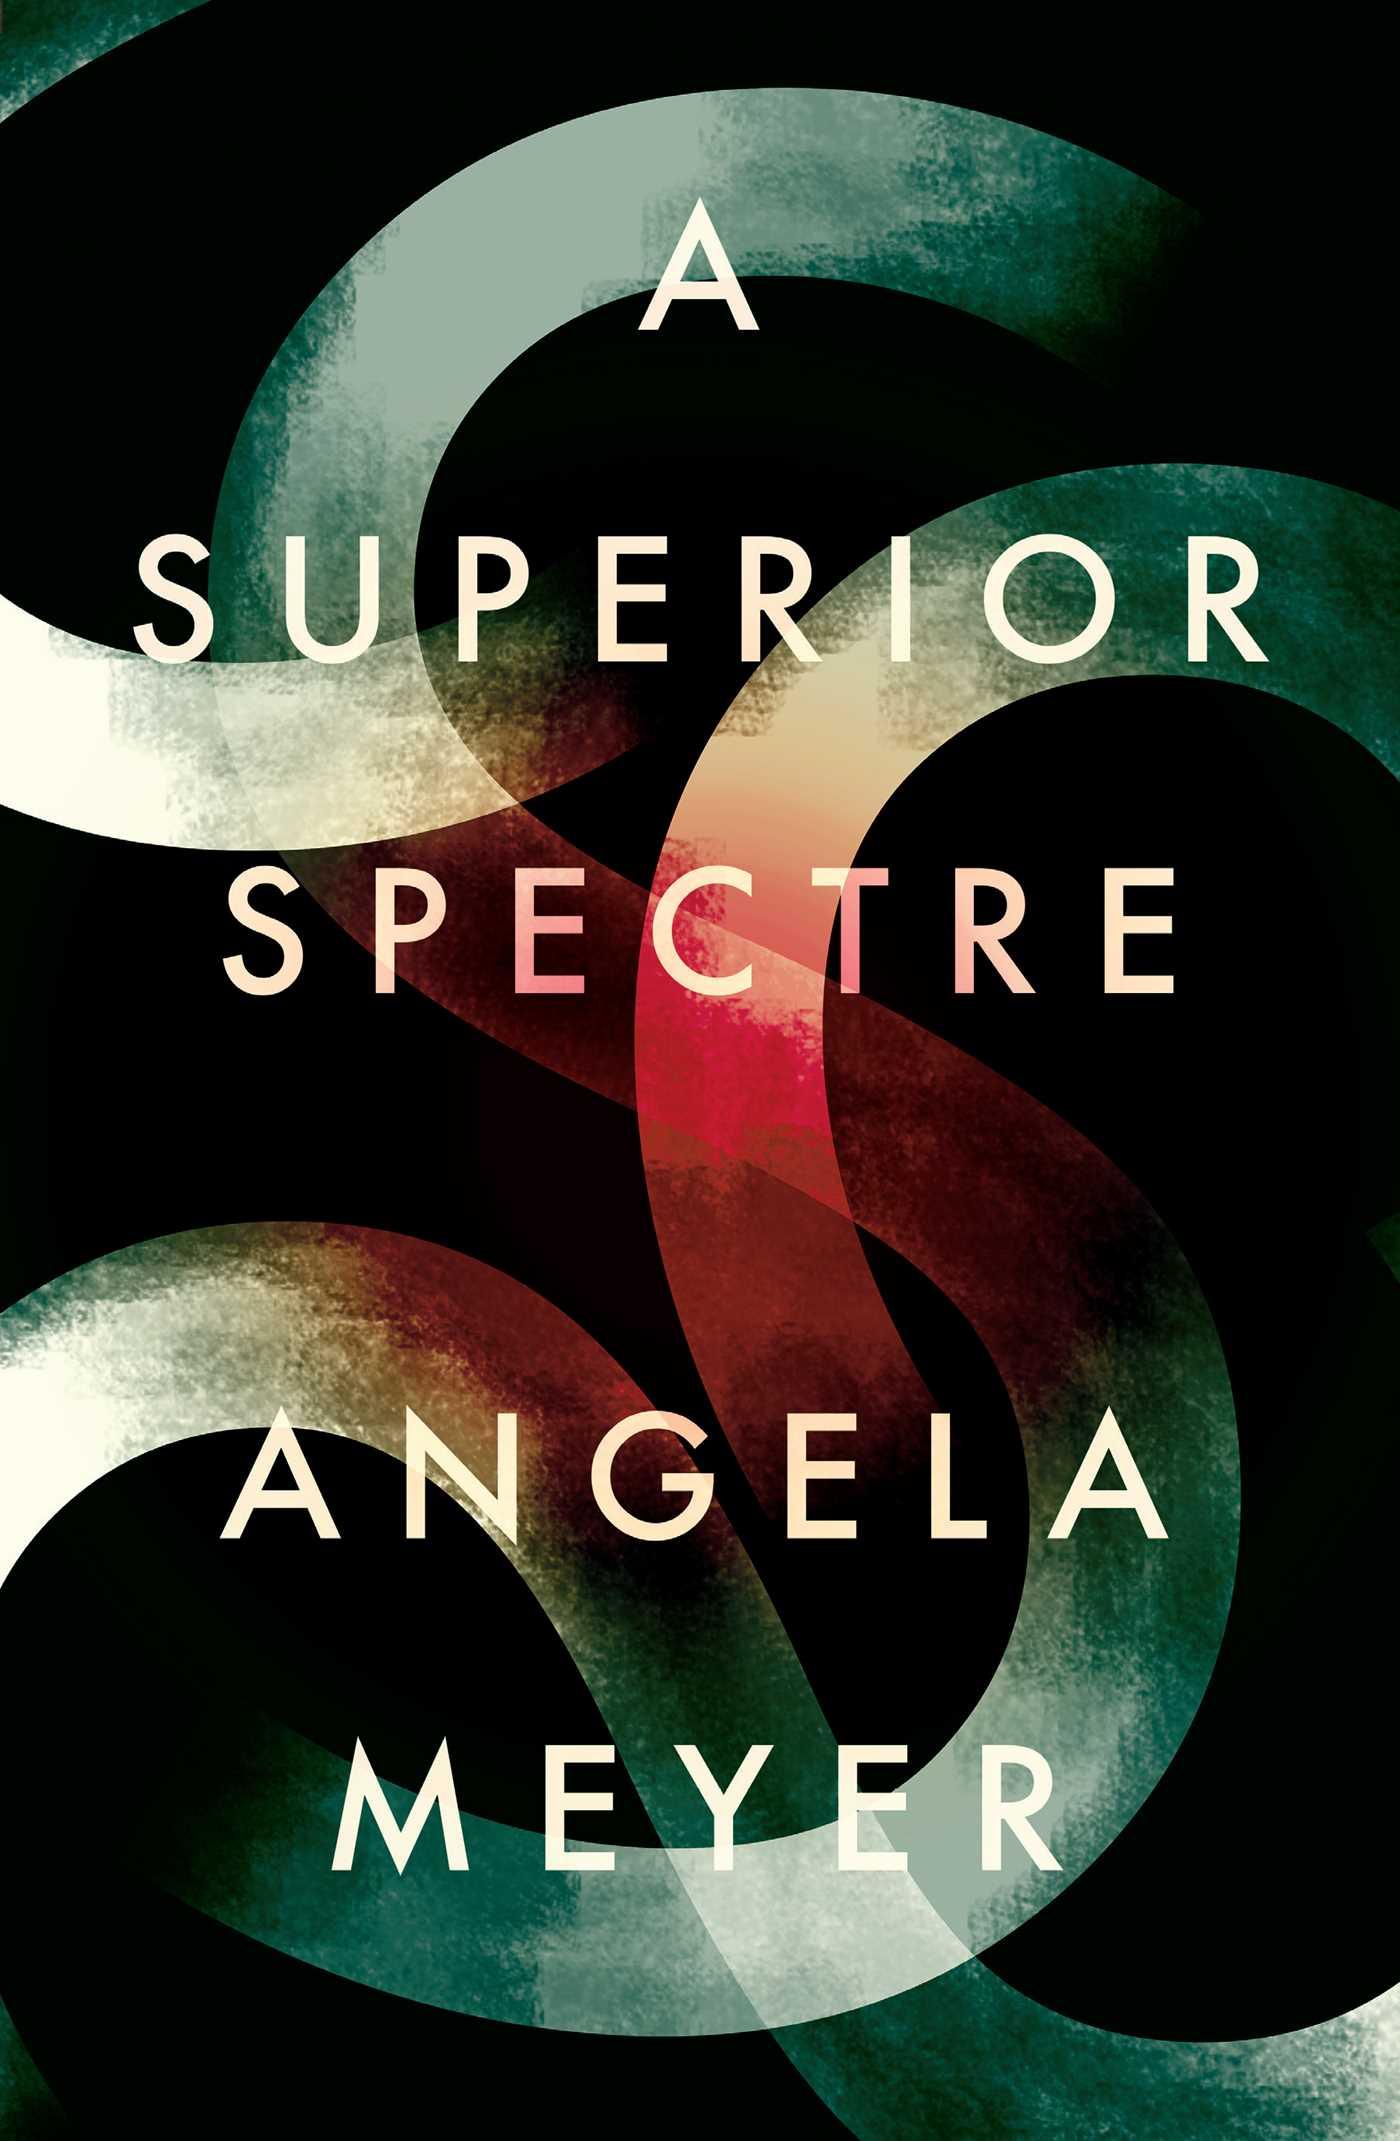 A superior spectre 9781925183924 hr